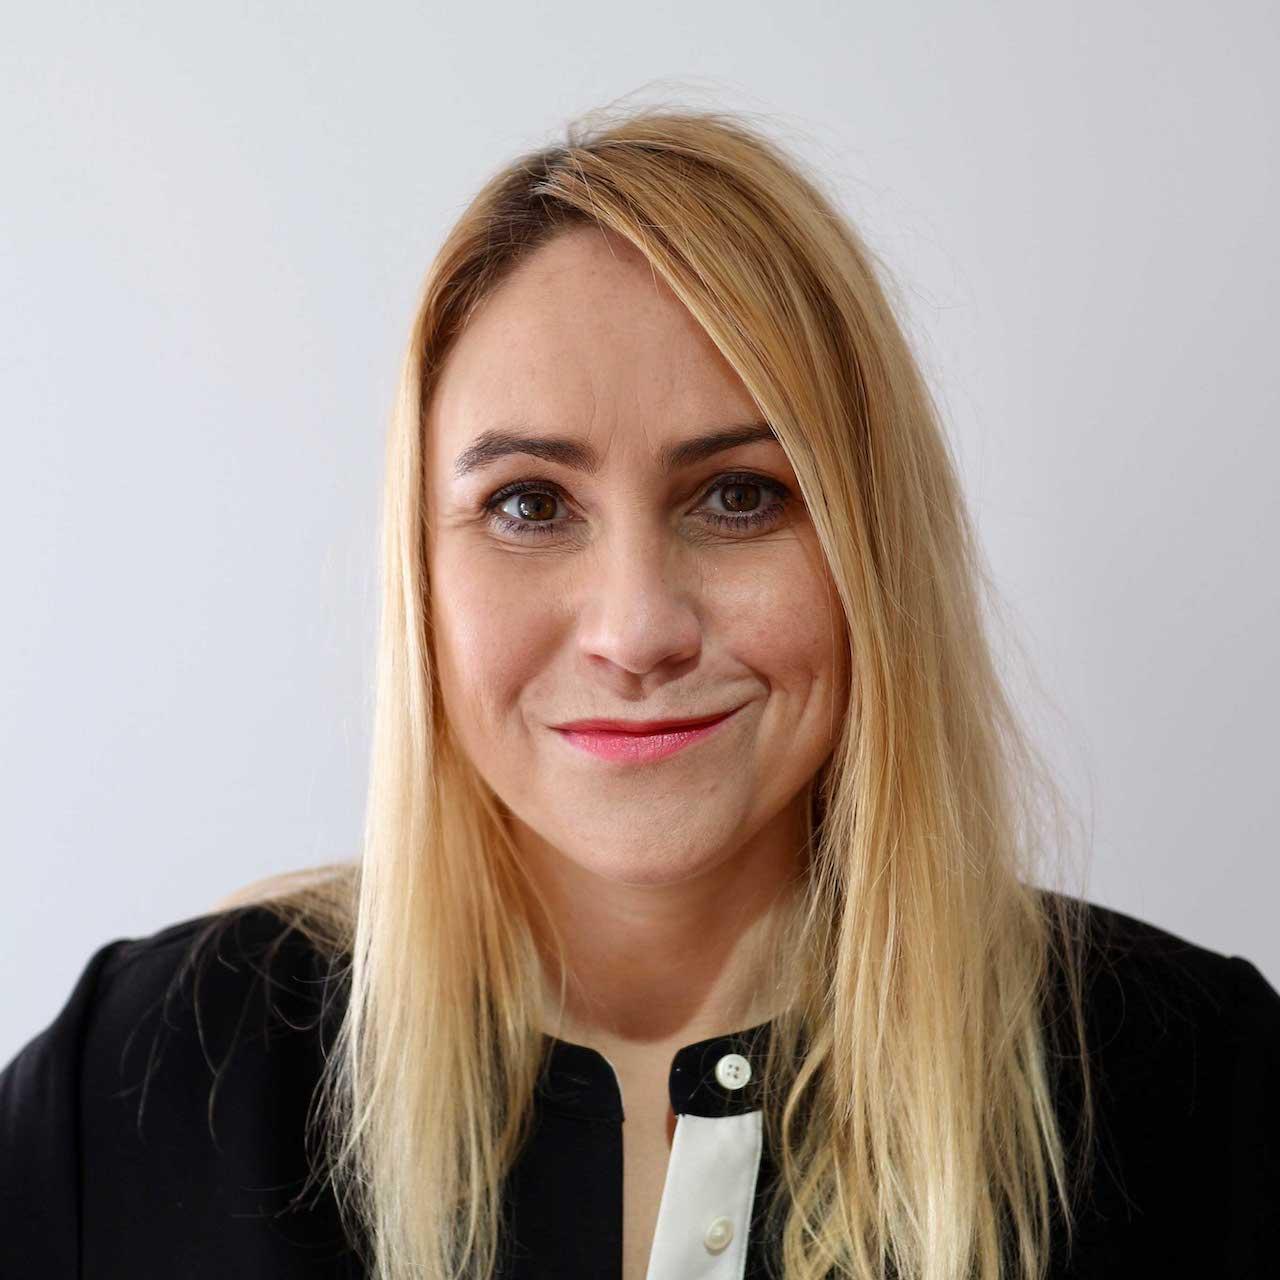 Elke Prochazka von Rat auf Draht